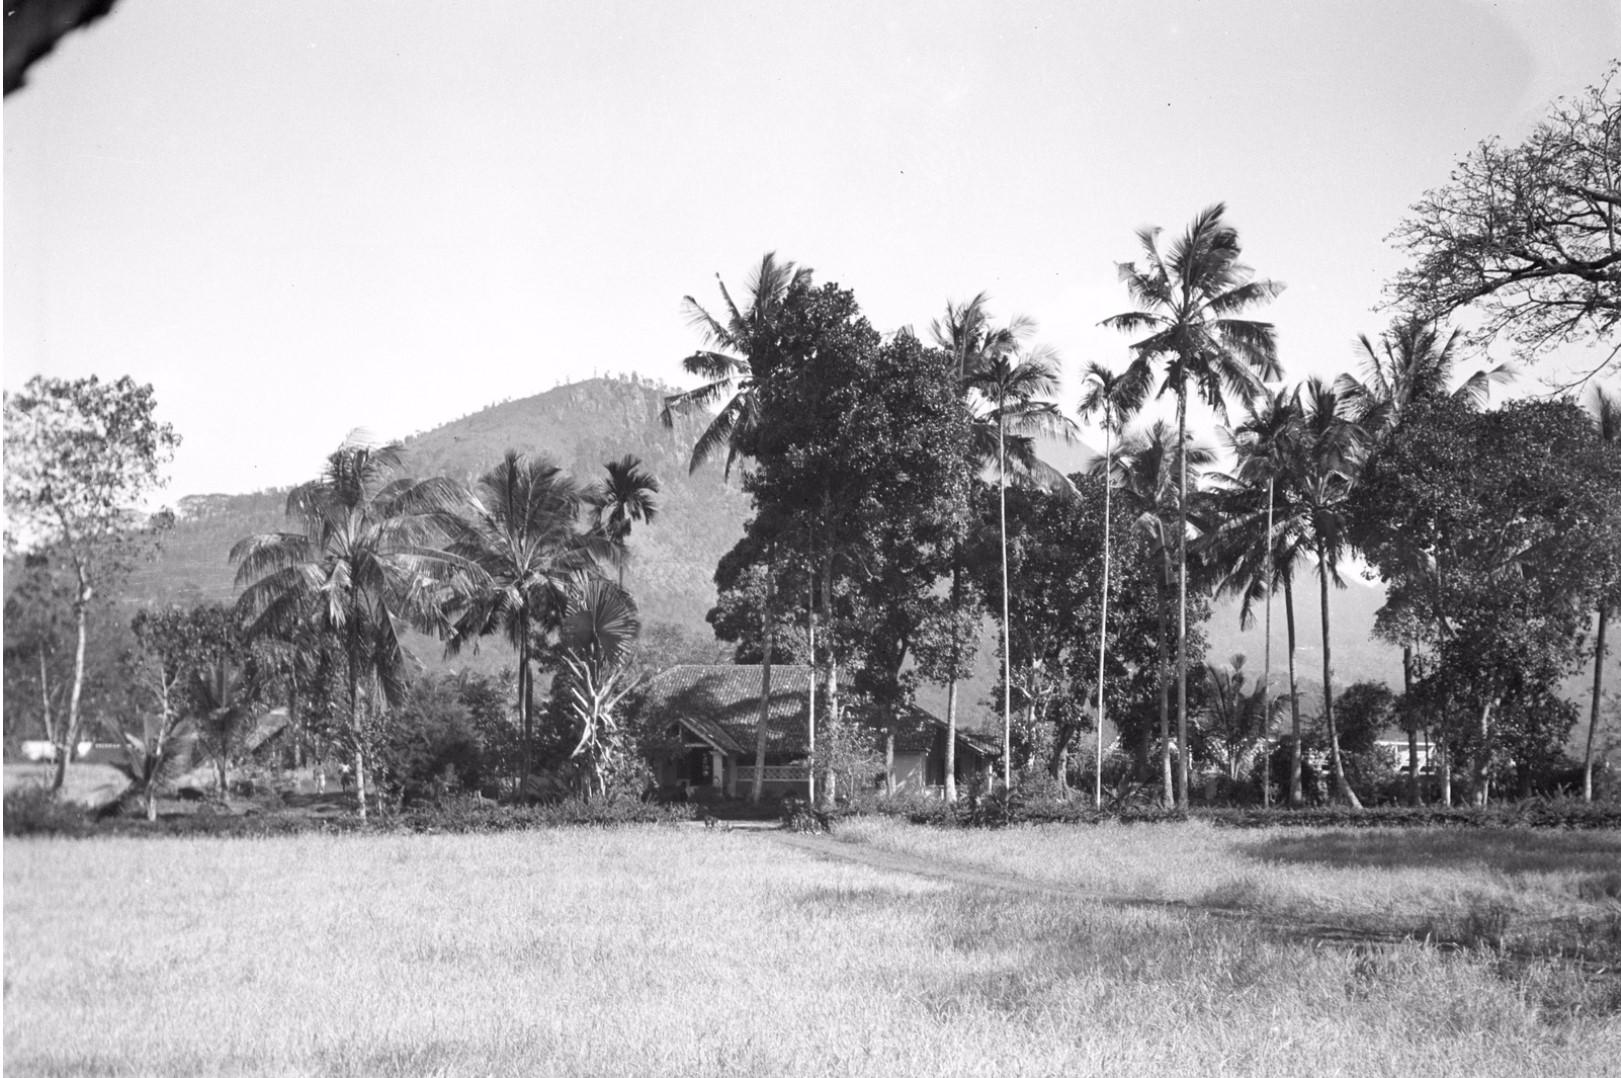 206. Ферма у рисового поля в окрестностях Бадуллу